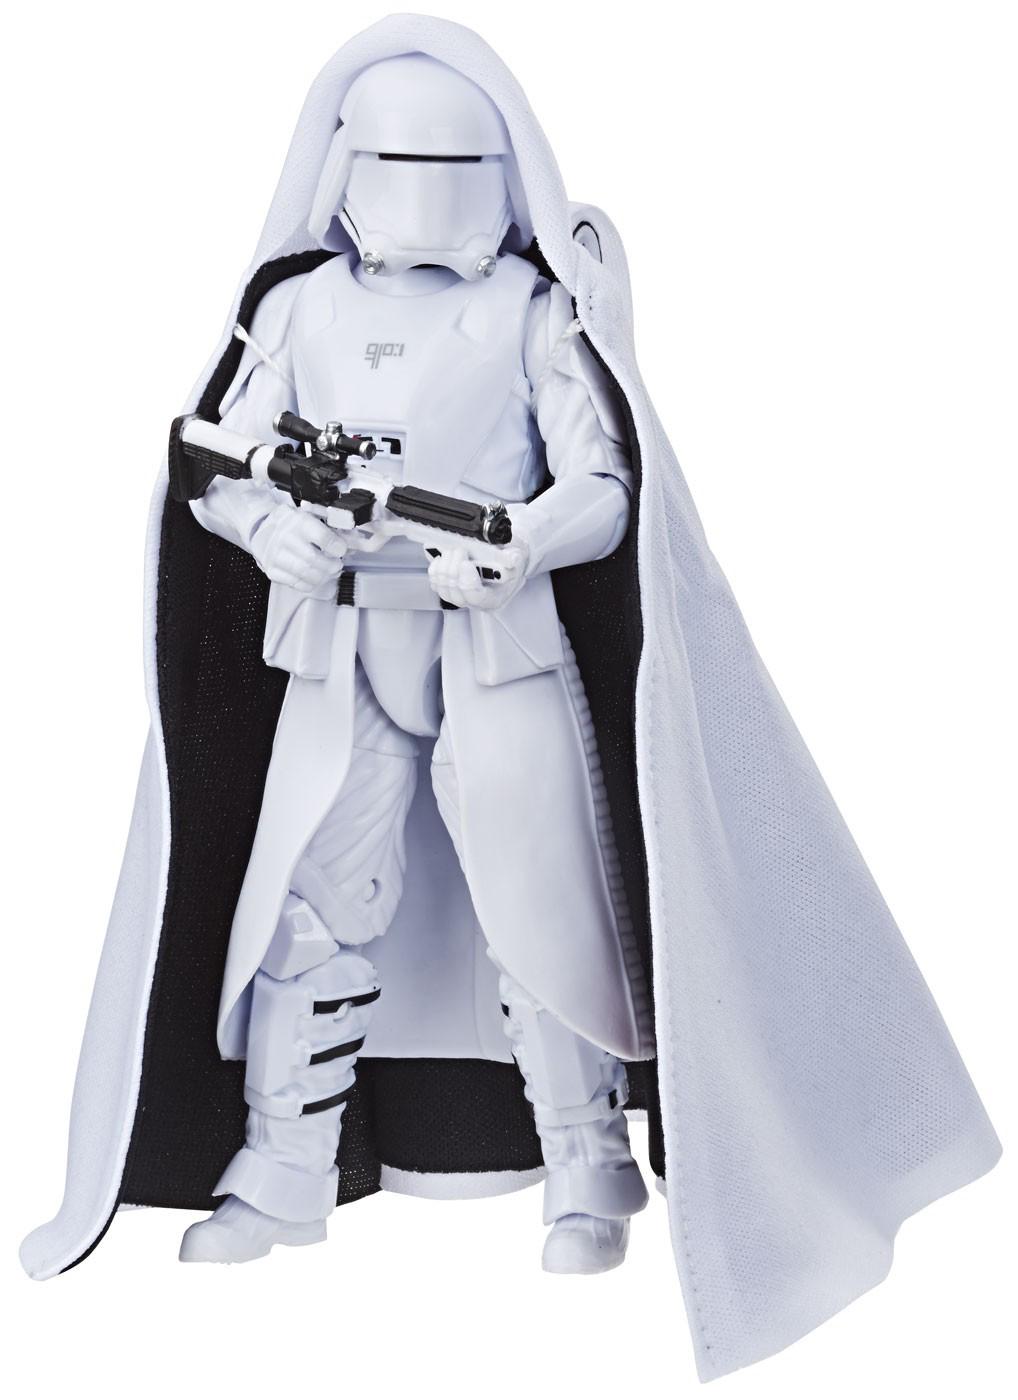 TROS FO Elite Snowtrooper Figure 2